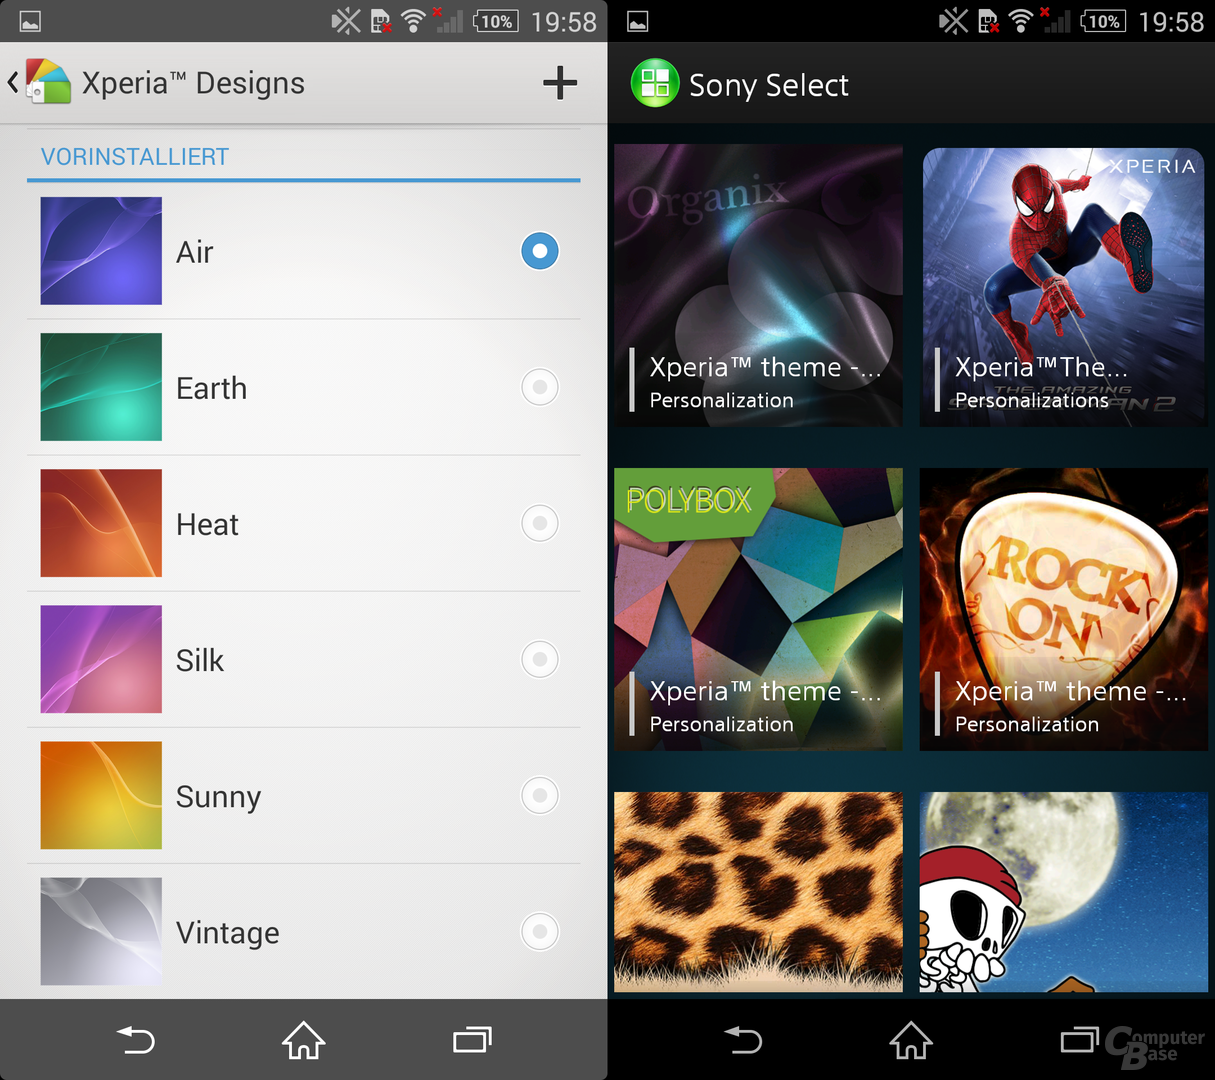 Xperia Designs & Sony Select